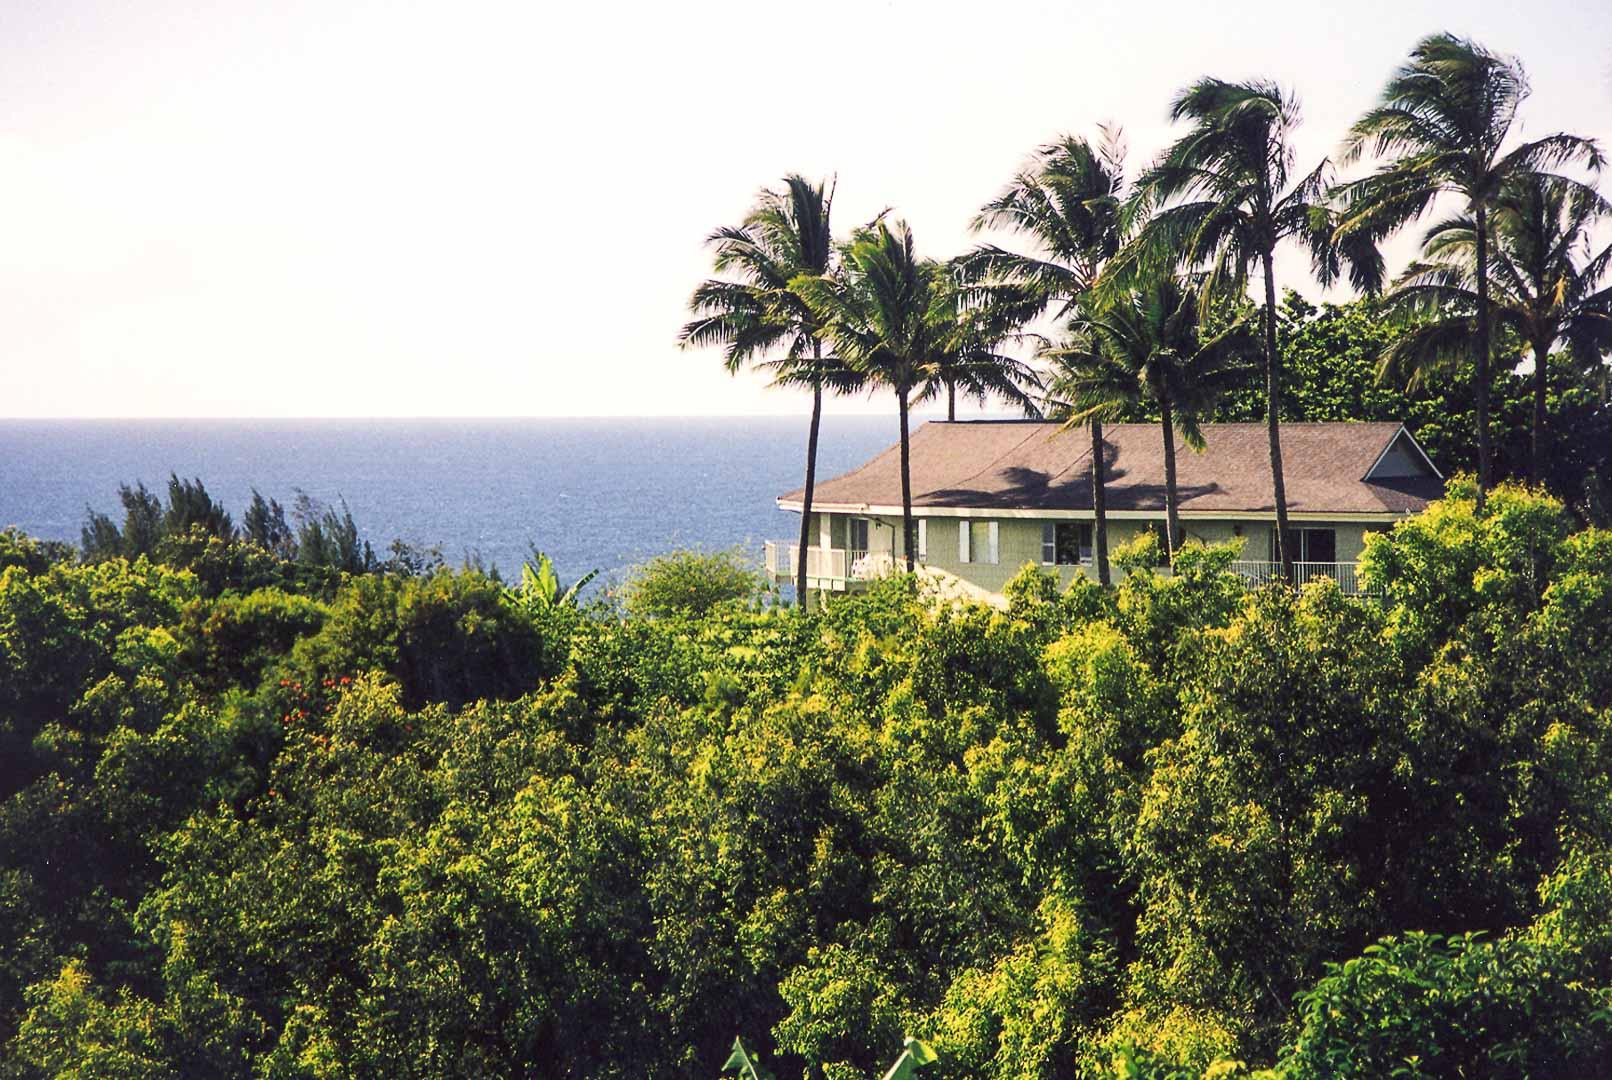 A quaint ocean view from VRI's Alii Kai Resort in Hawaii